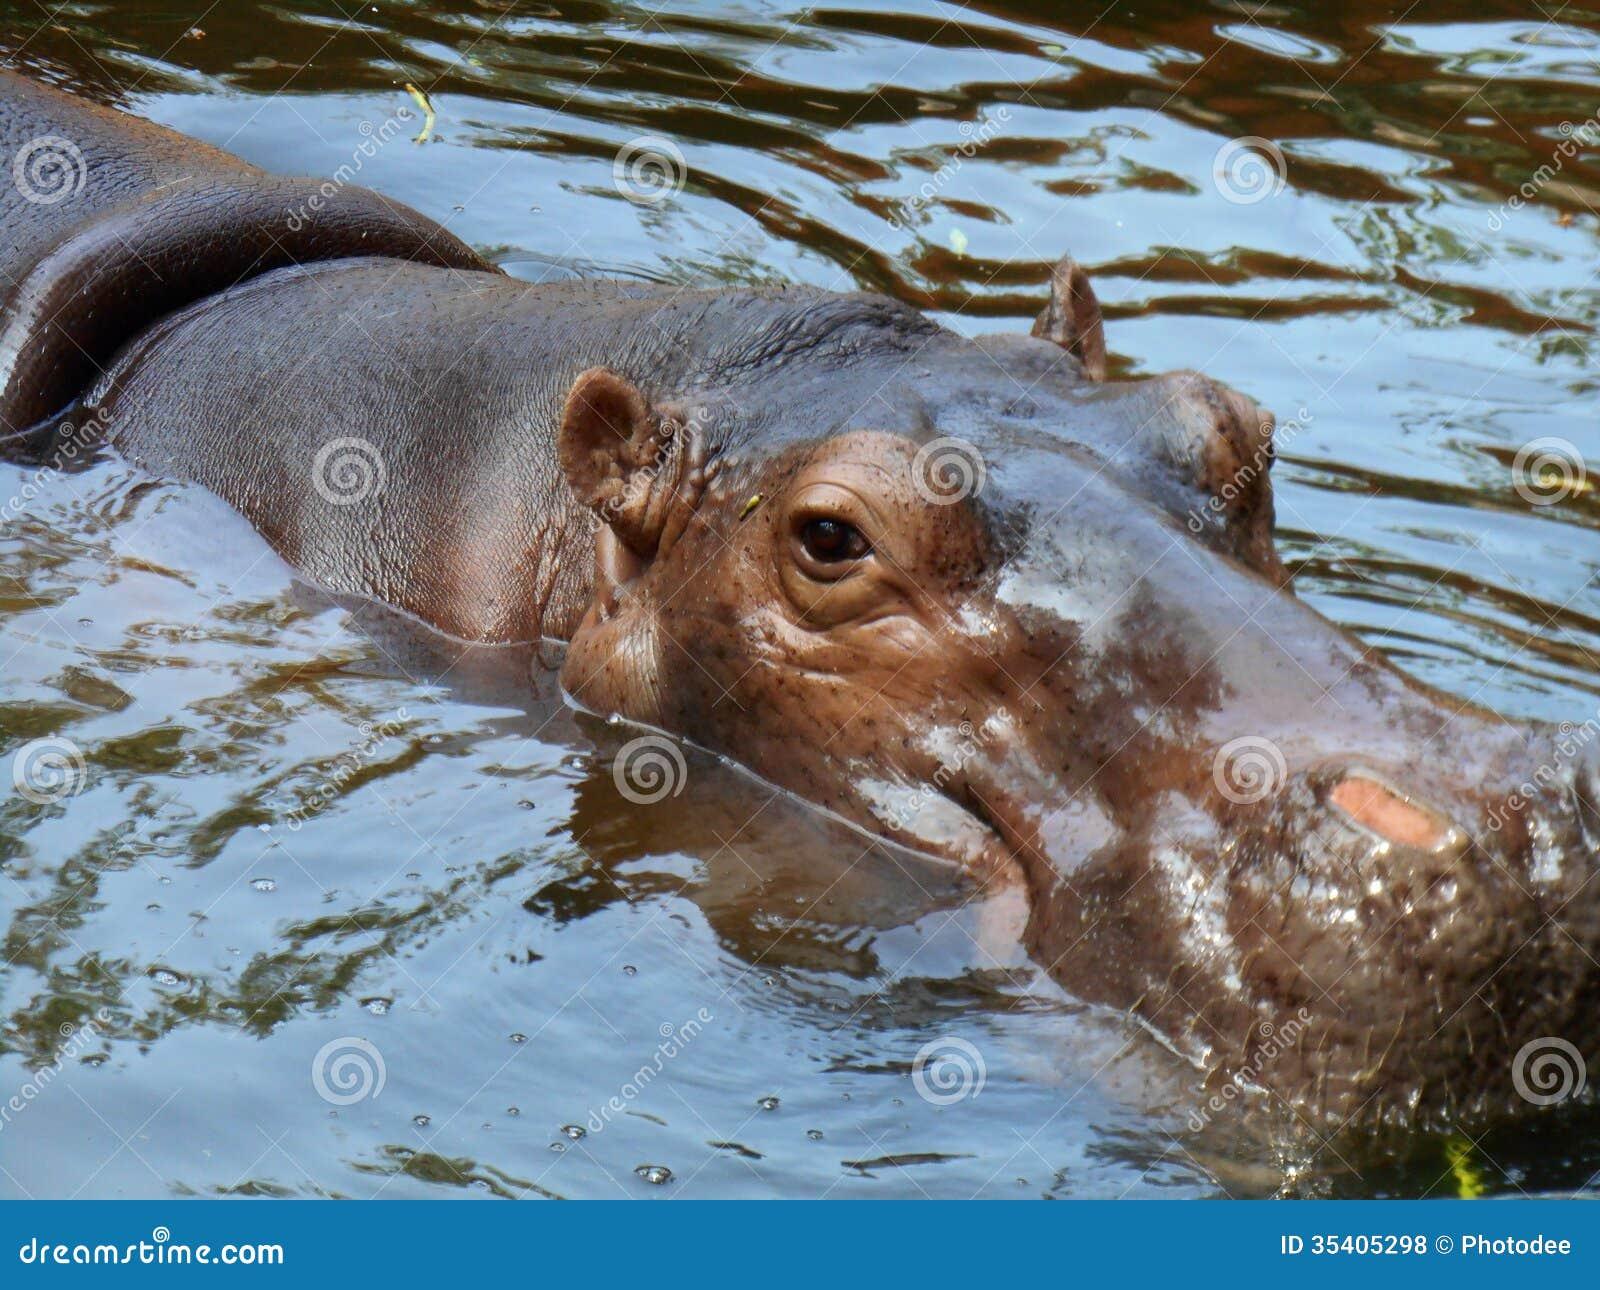 Hippo portrait